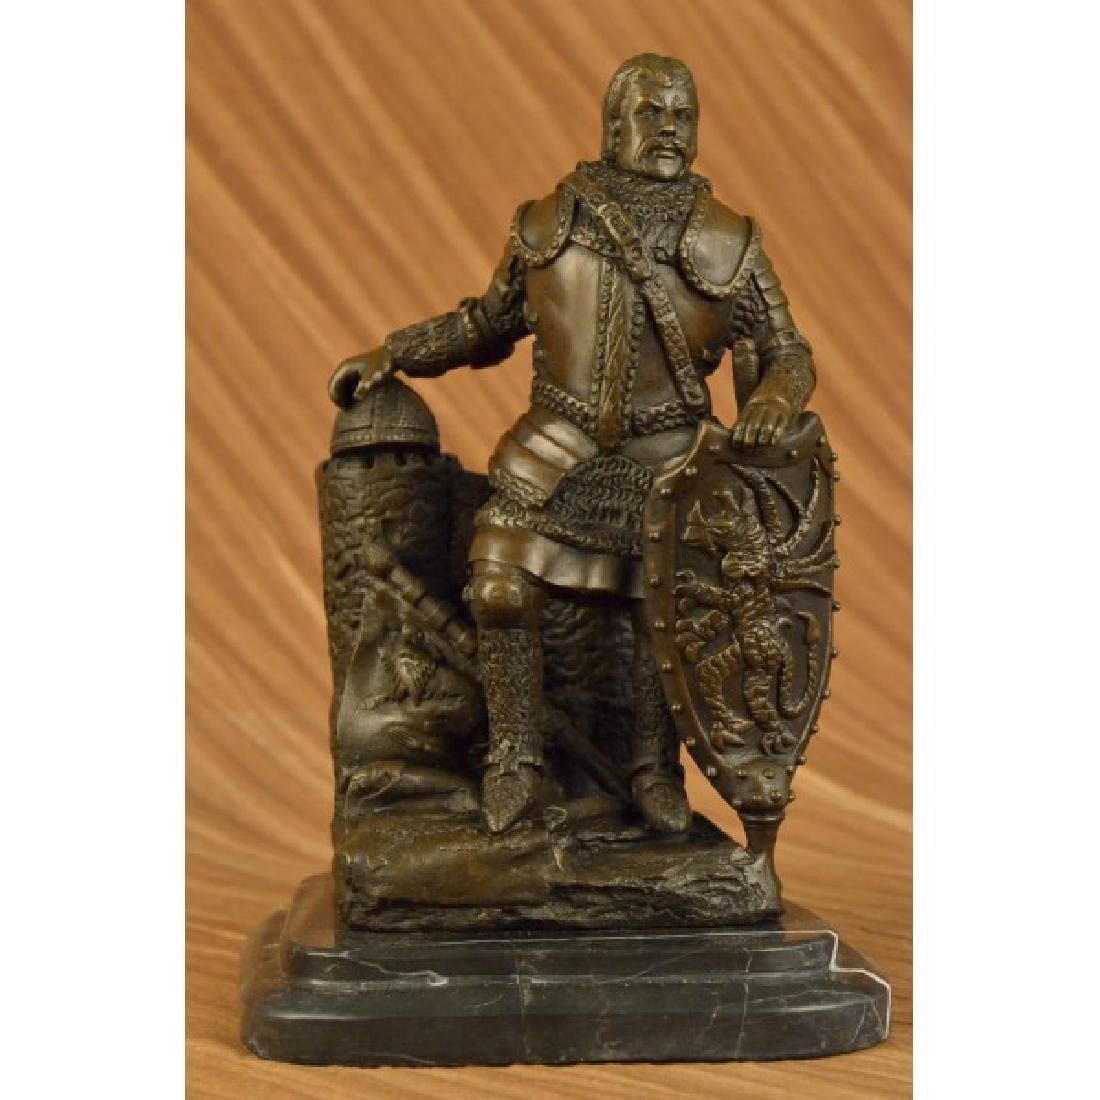 Dalov Heavy Armor Viking Warrior Bronze Sculpture